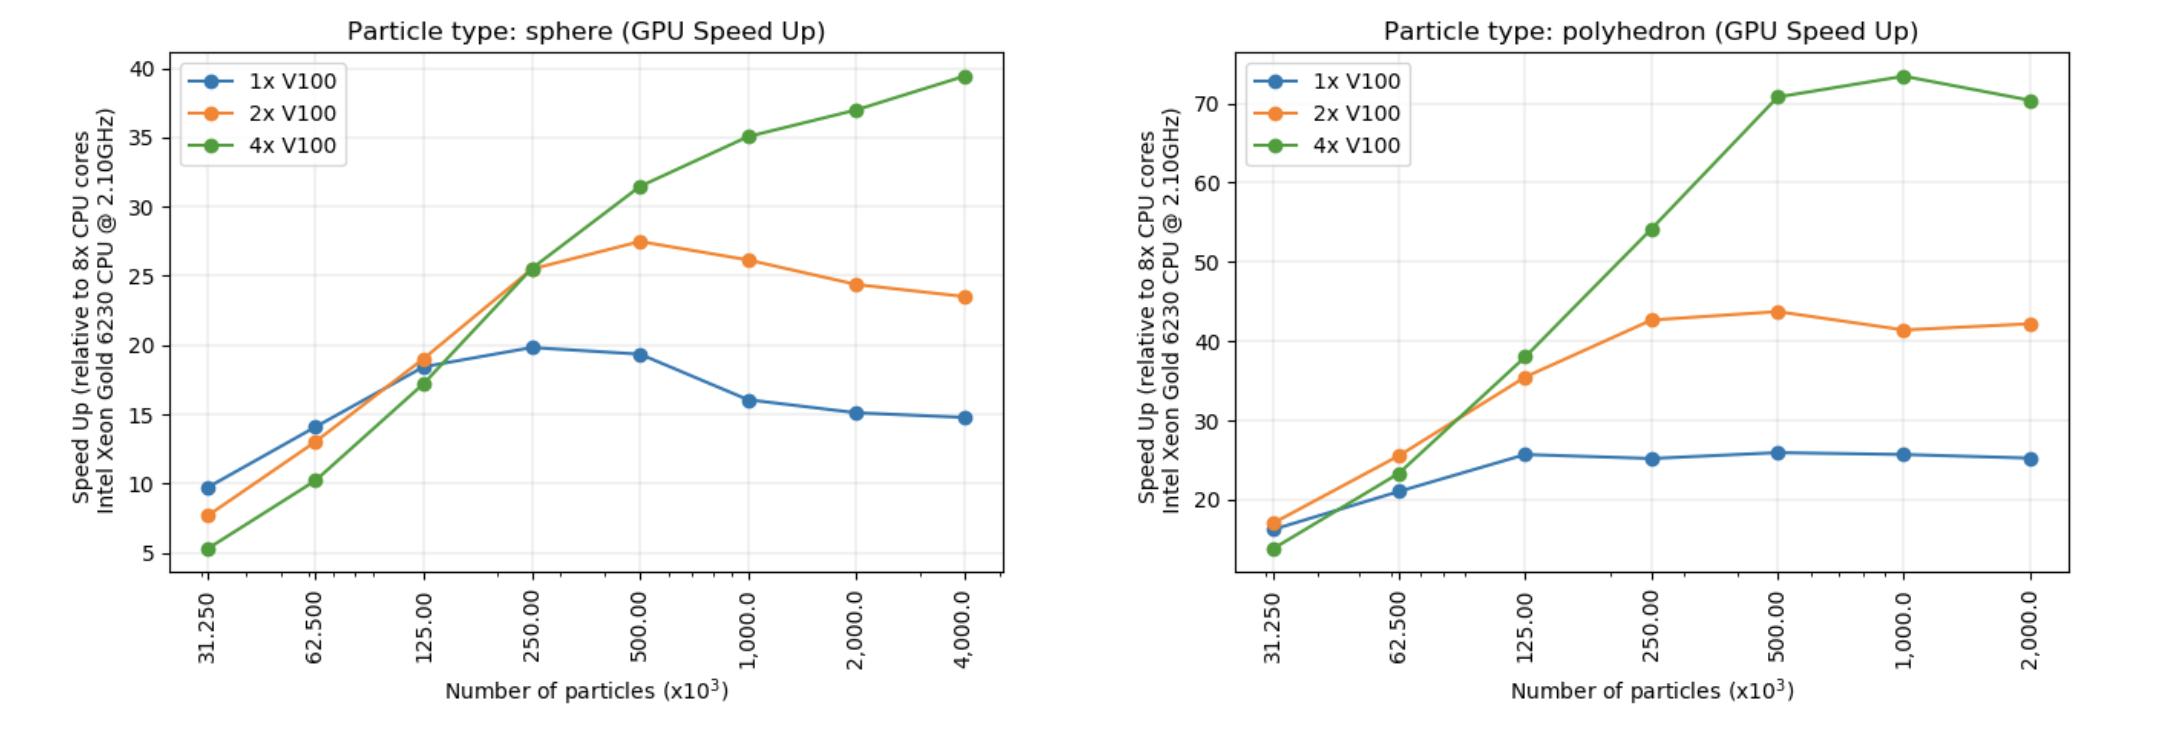 GPU speed up